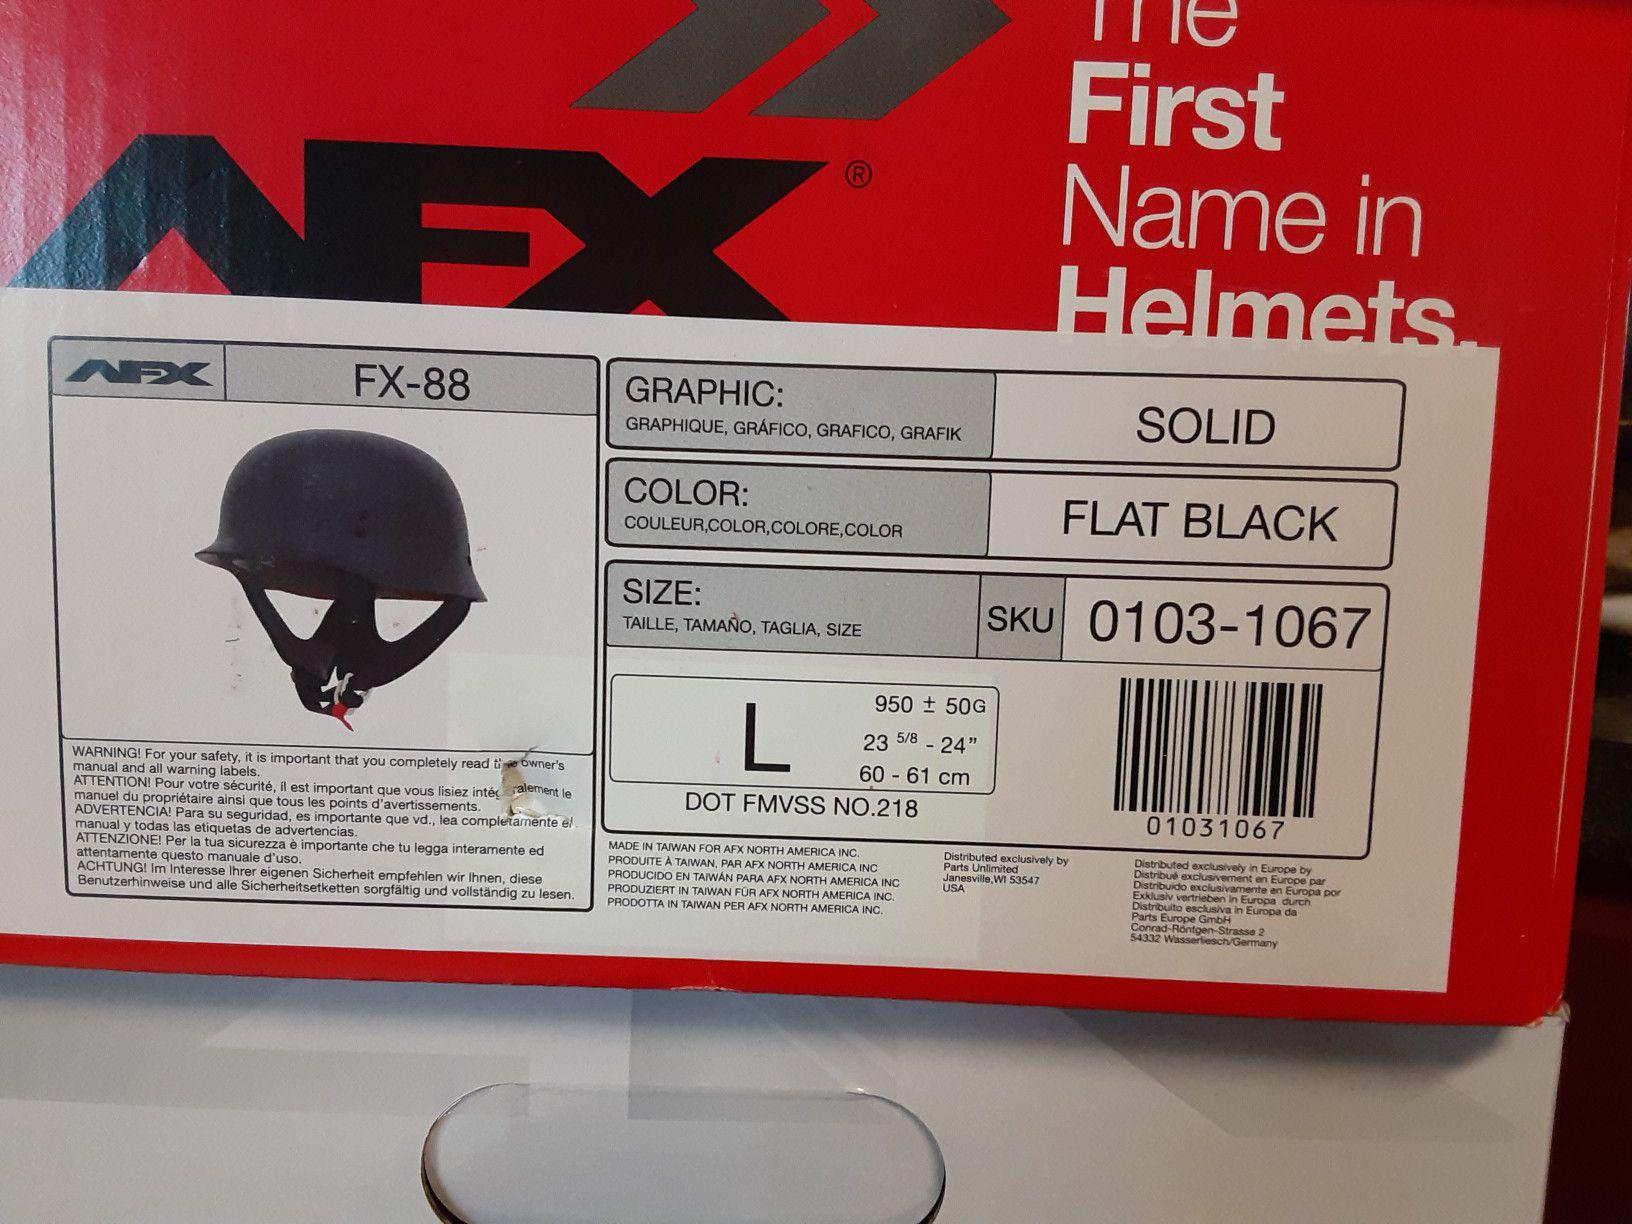 Photo AFX FX88 Flat Black Solid Helmet